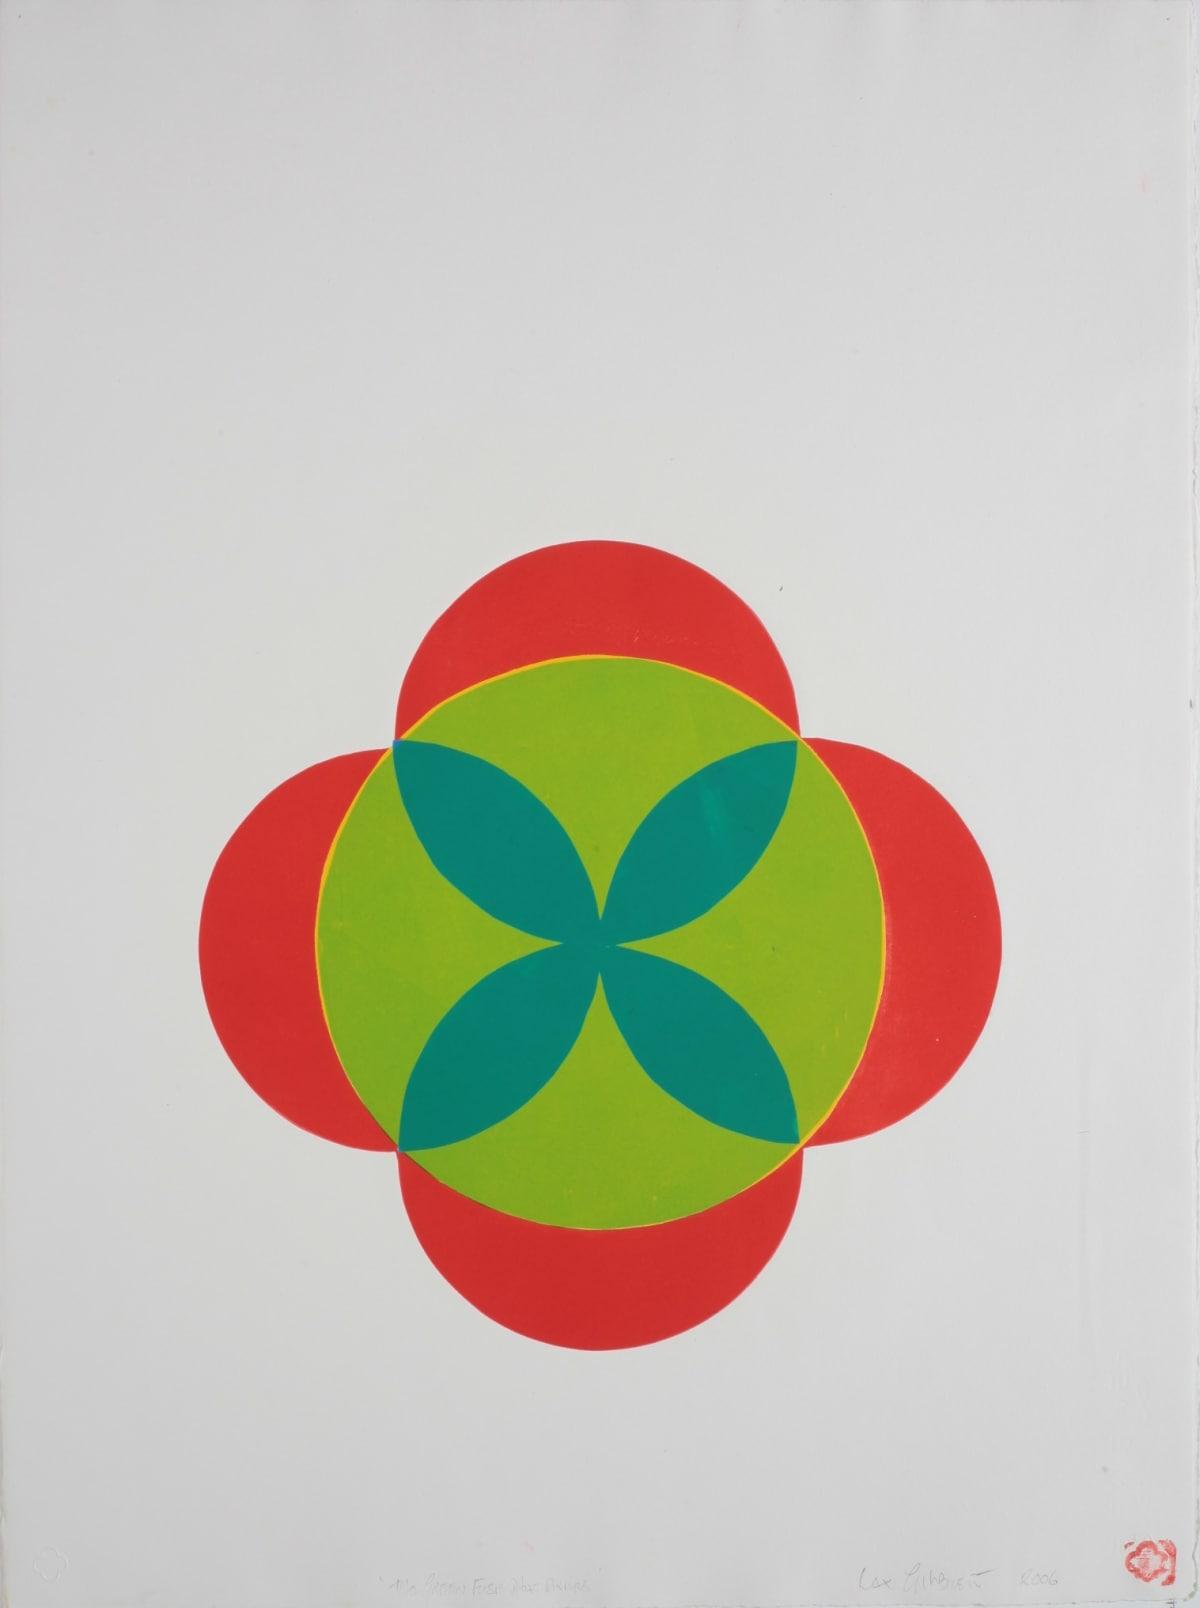 Max GIMBLETT The Green Fuse that Drives, 2006 Monoprint 762 x 559 mm